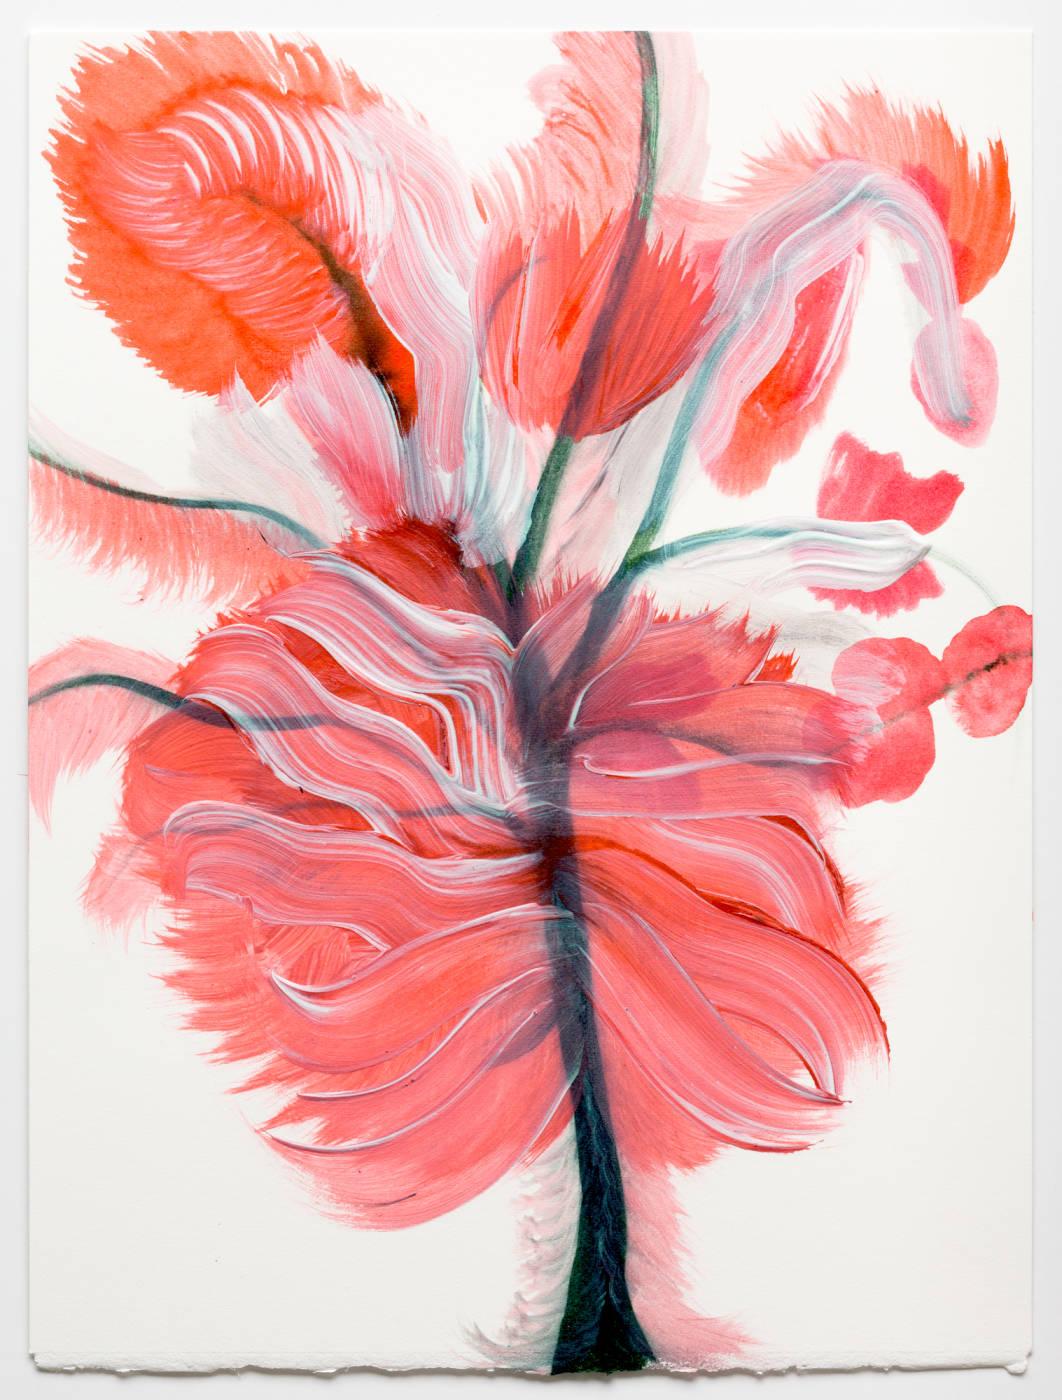 Coral Pink Flower 3